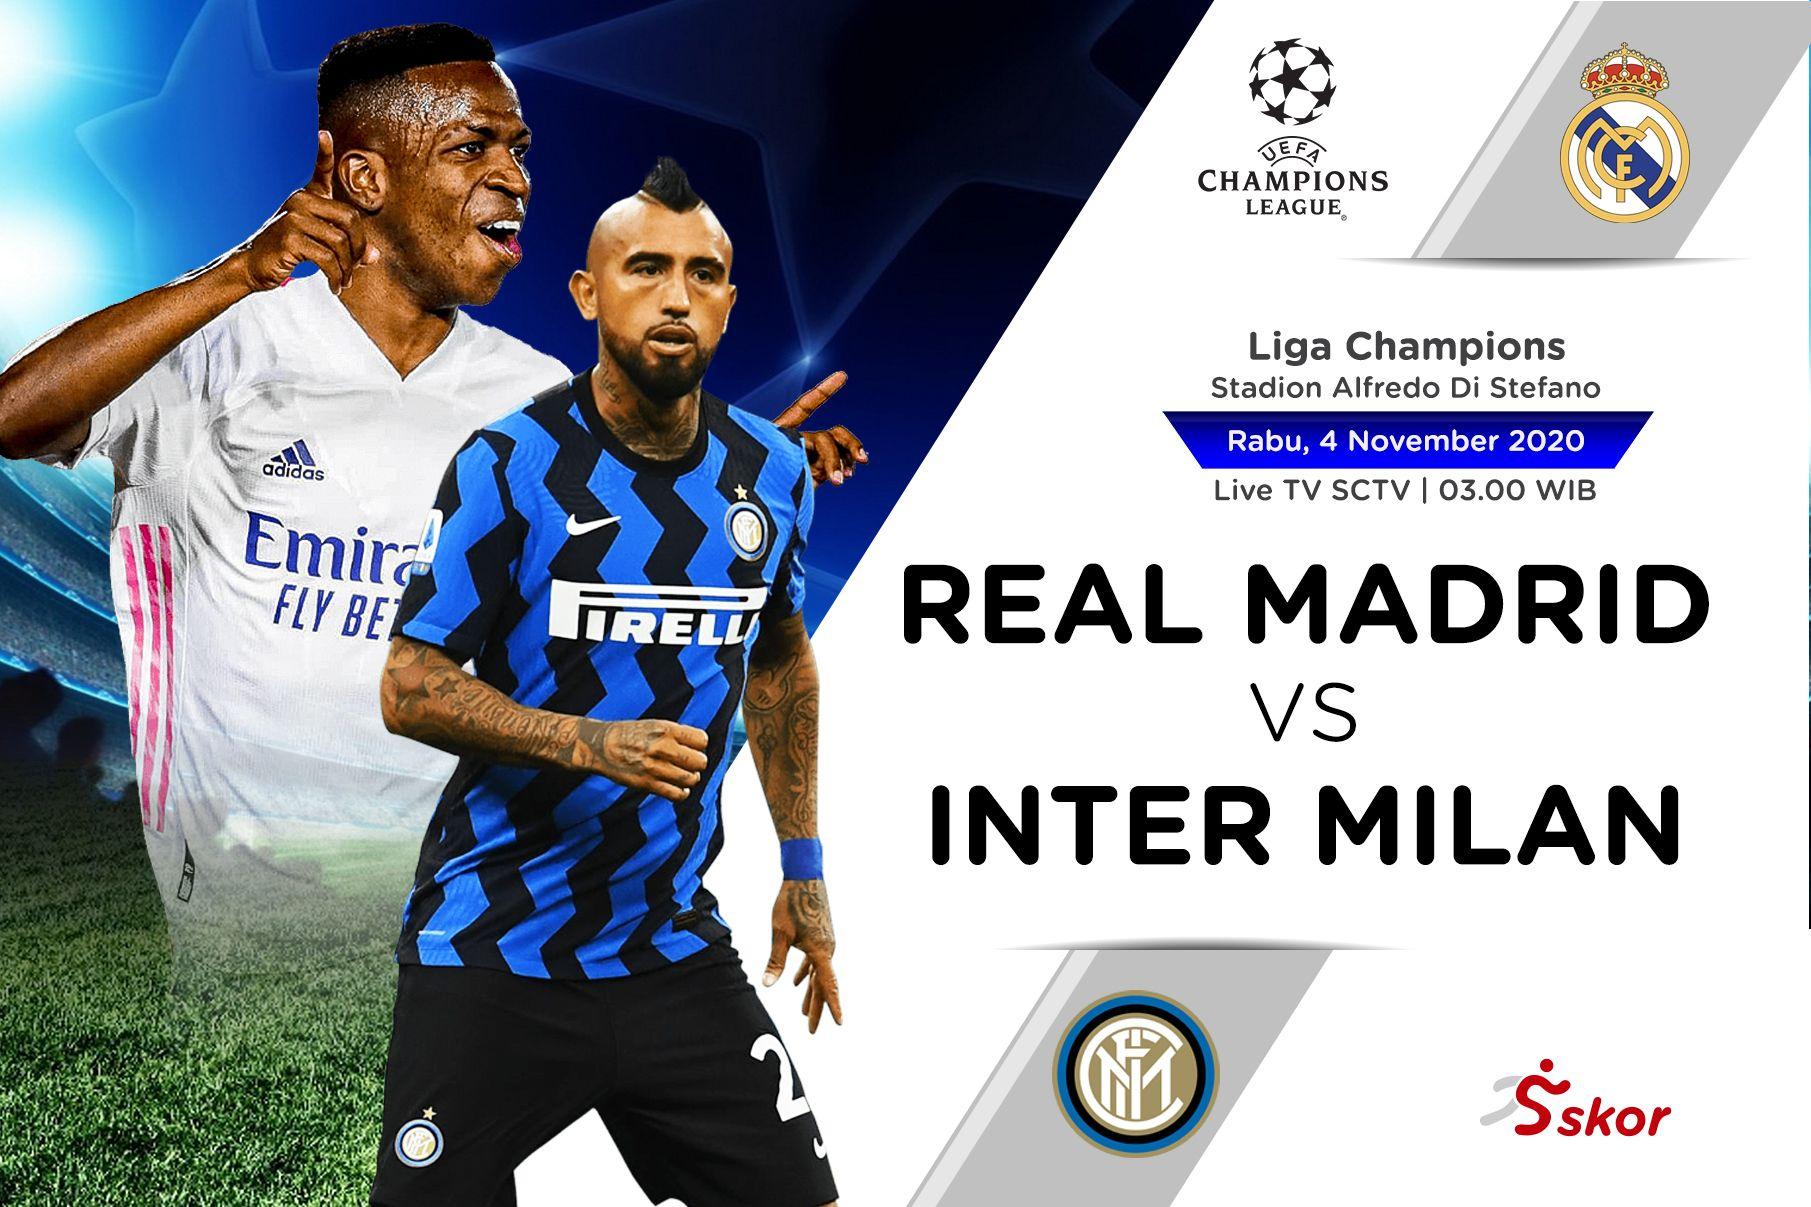 Perkiraan Line Up Real Madrid Vs Inter Milan Koran Pagi